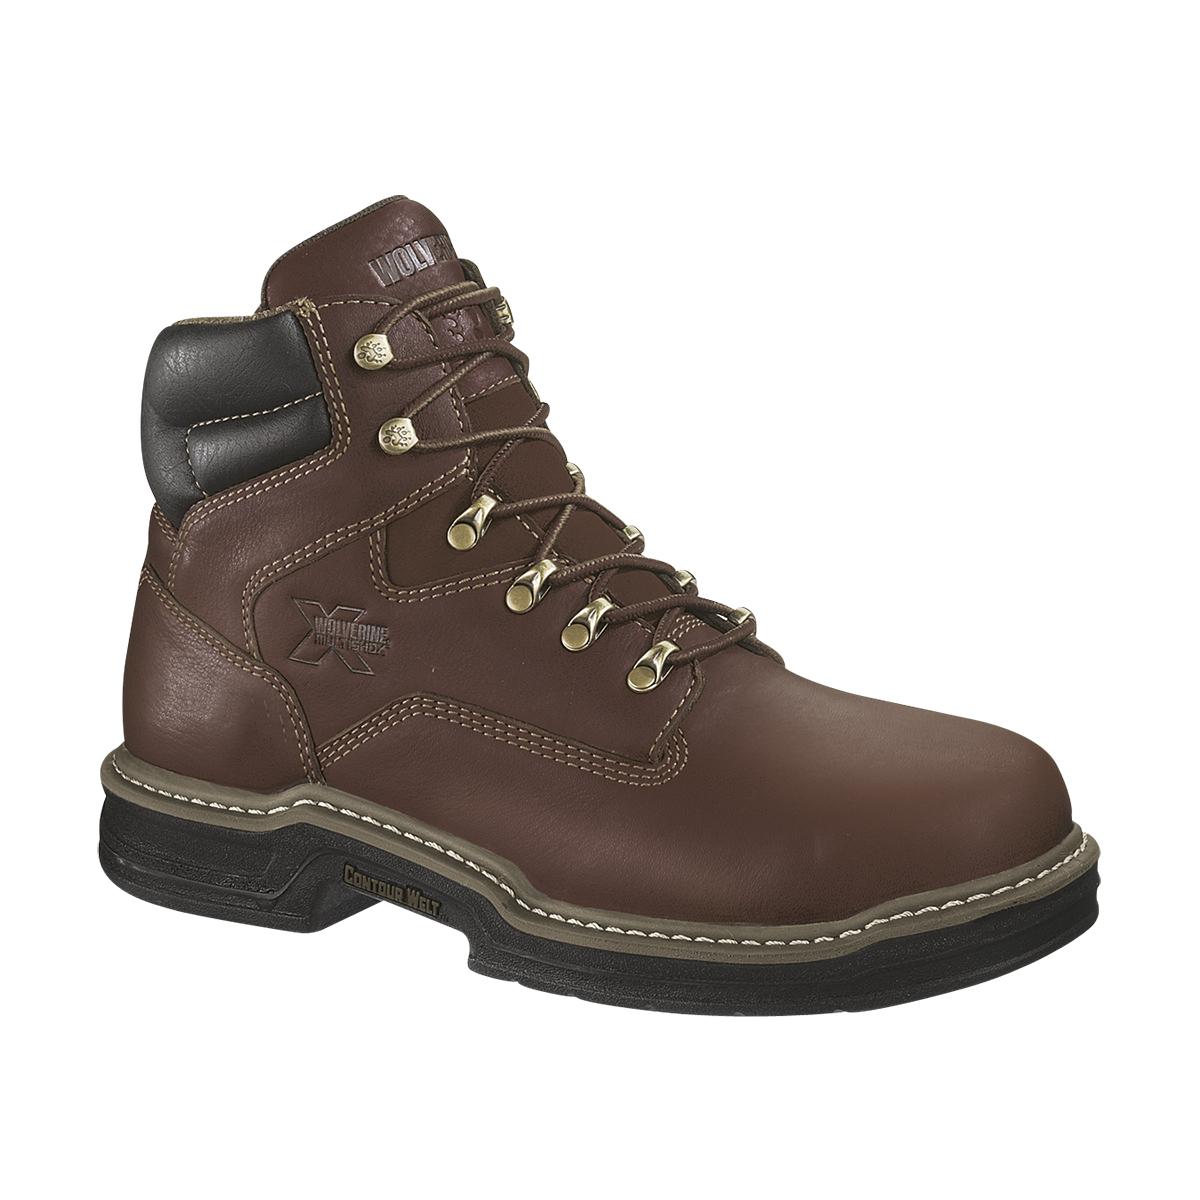 Wolverine Met Guard Steel Toe Work Boots W02406